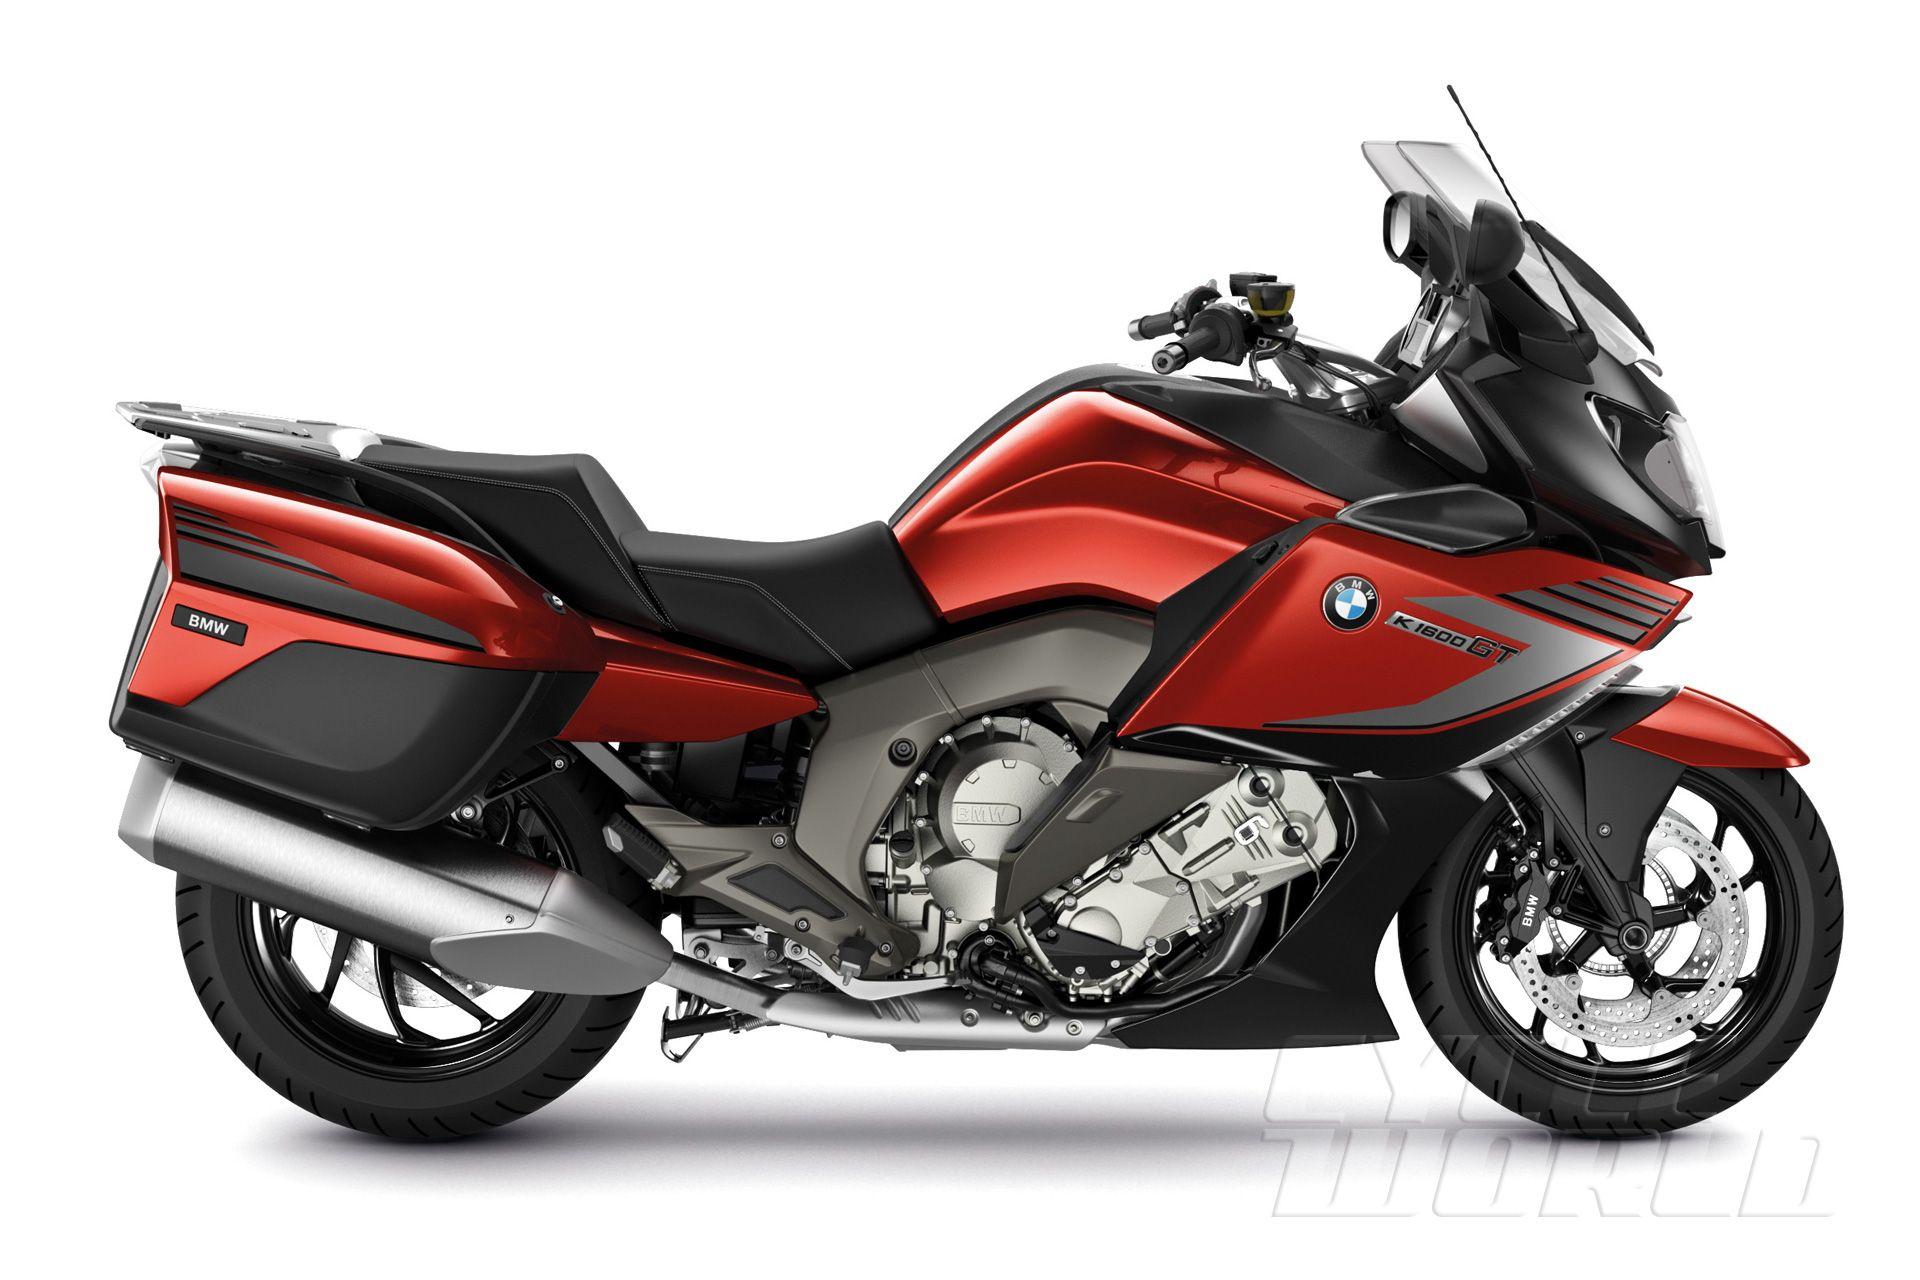 2014 Bmw K1600gt First Look Review Photos Bmw Motorrad Bmw Motors Bmw